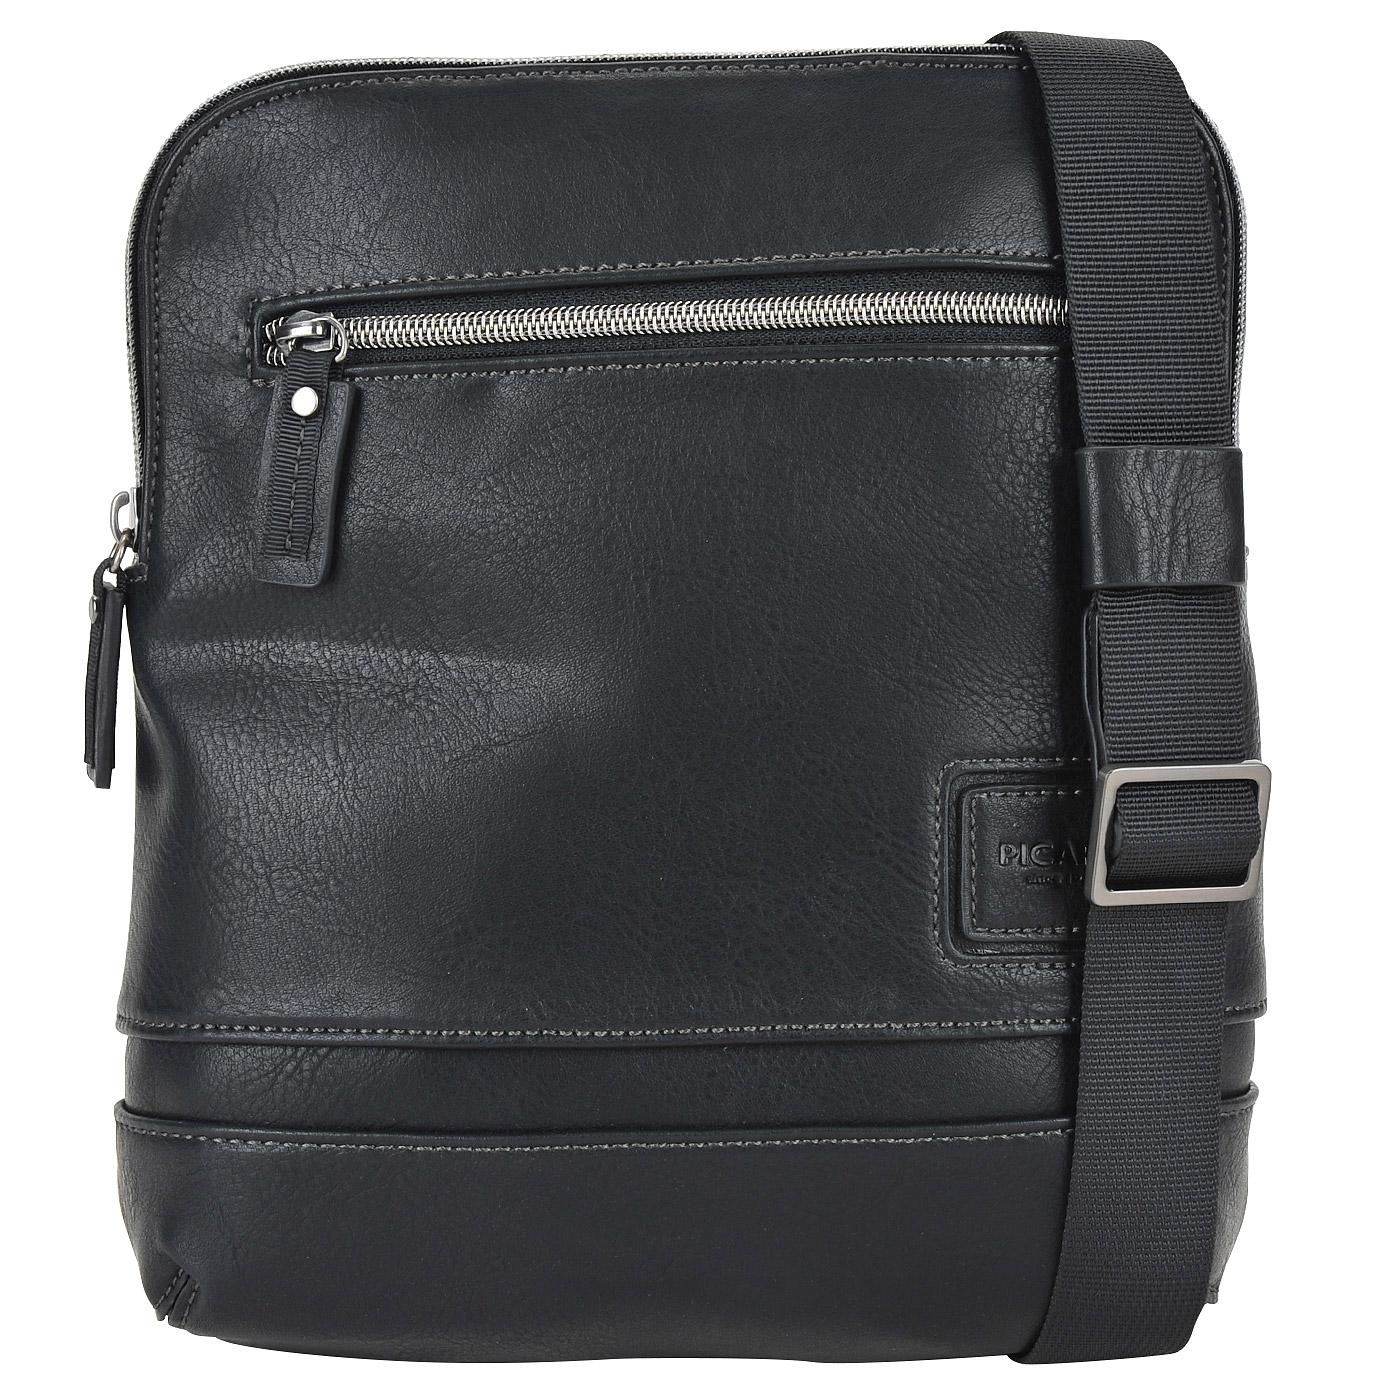 6b050a365930 Мужская сумка через плечо Picard Breakers Мужская сумка через плечо Picard  Breakers ...